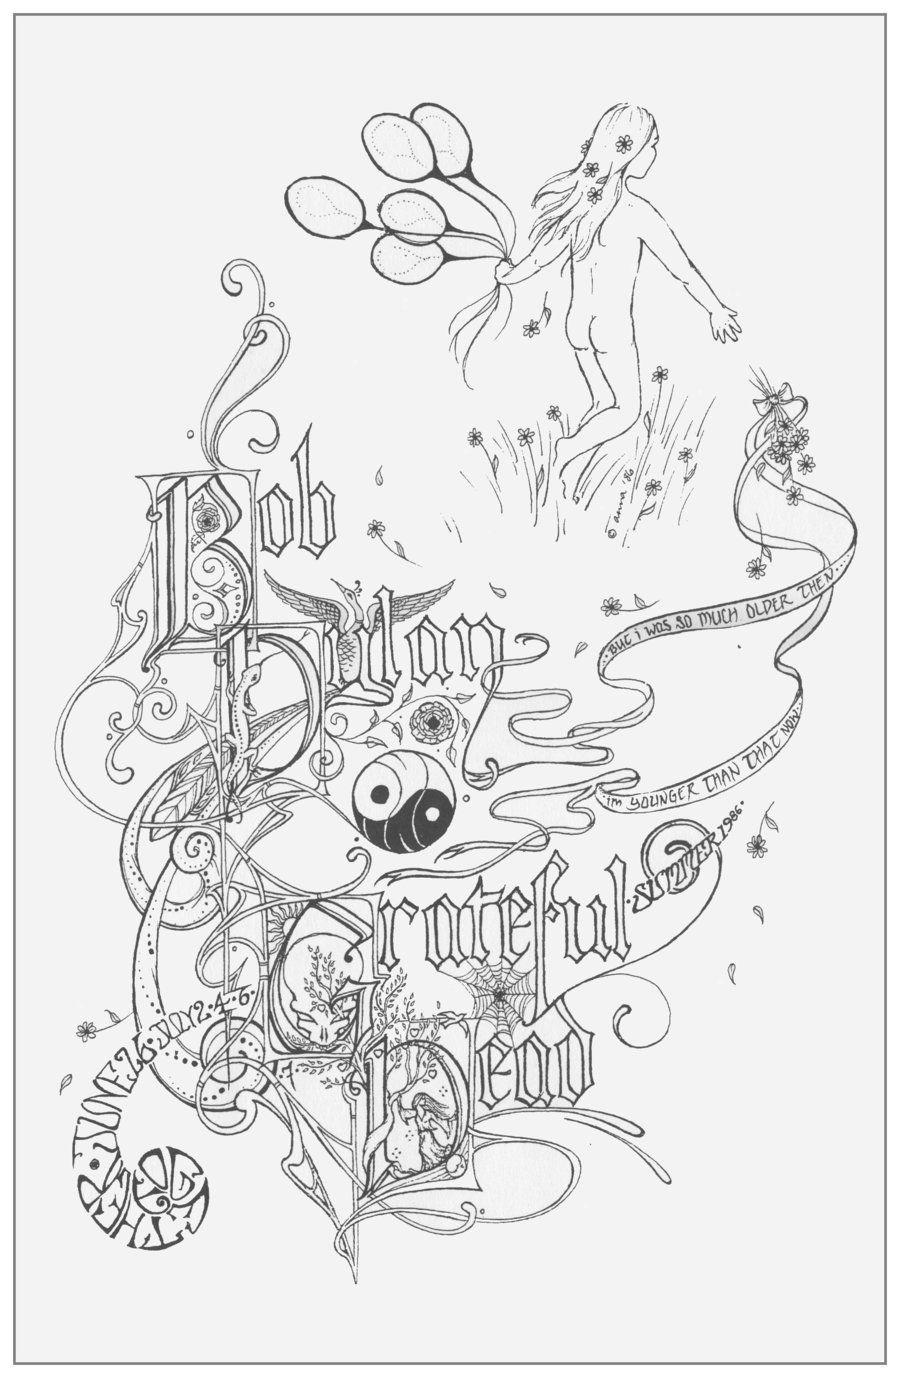 Grateful Dead Coloring Pages : grateful, coloring, pages, Grateful, Coloring, Pages, Hippie, Pinterest, Dead,, Books,, Bears